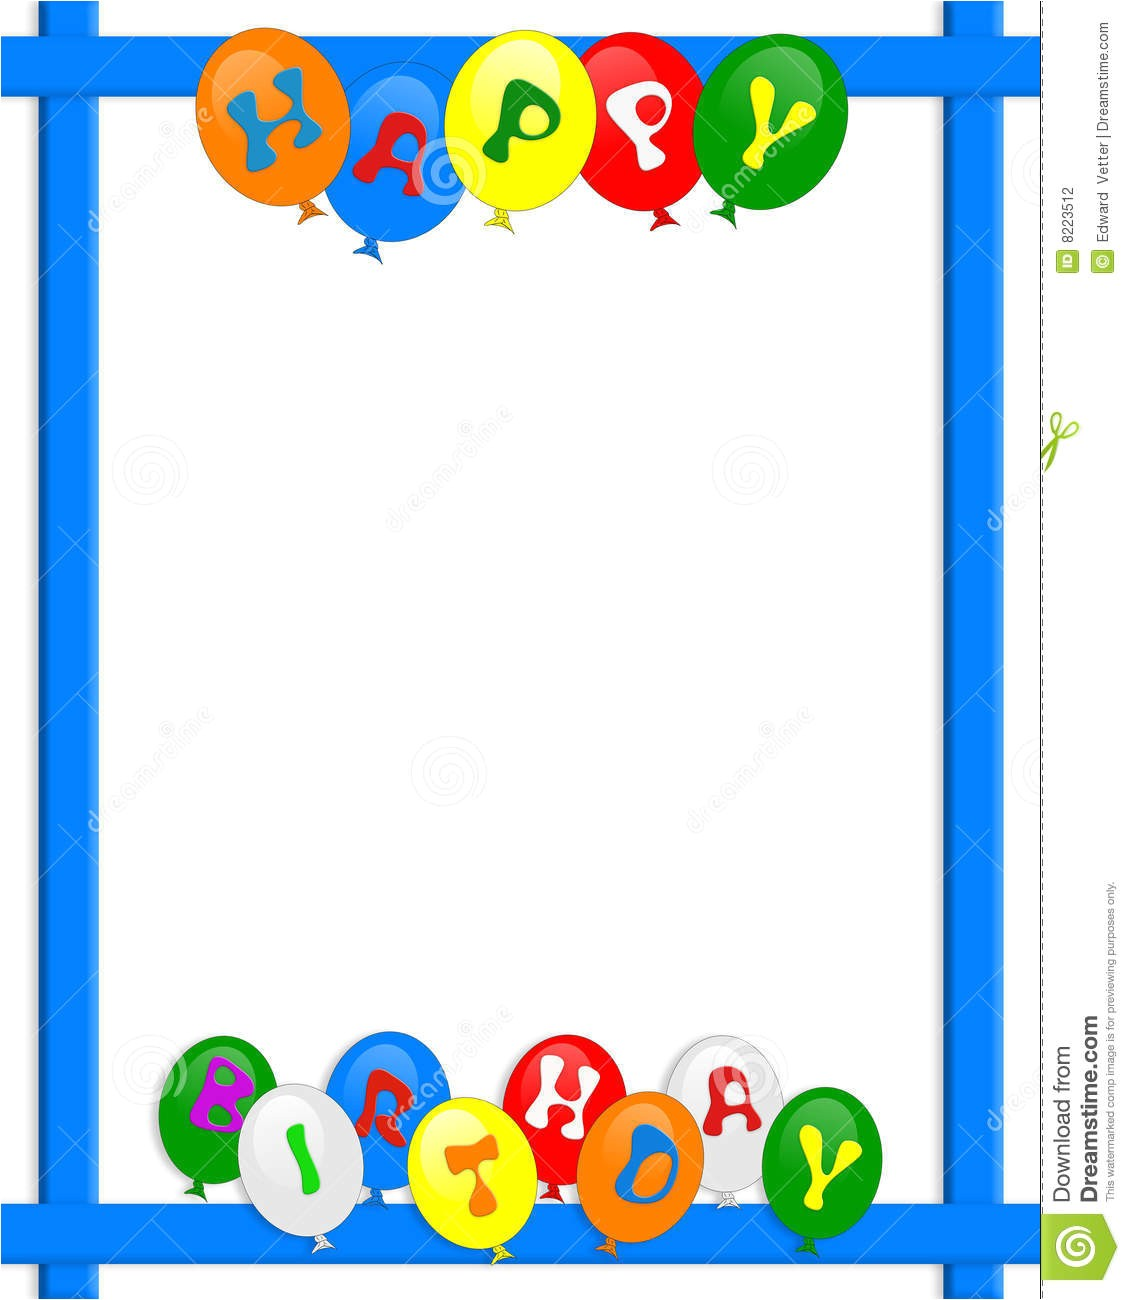 stock photography happy birthday balloons border frame image